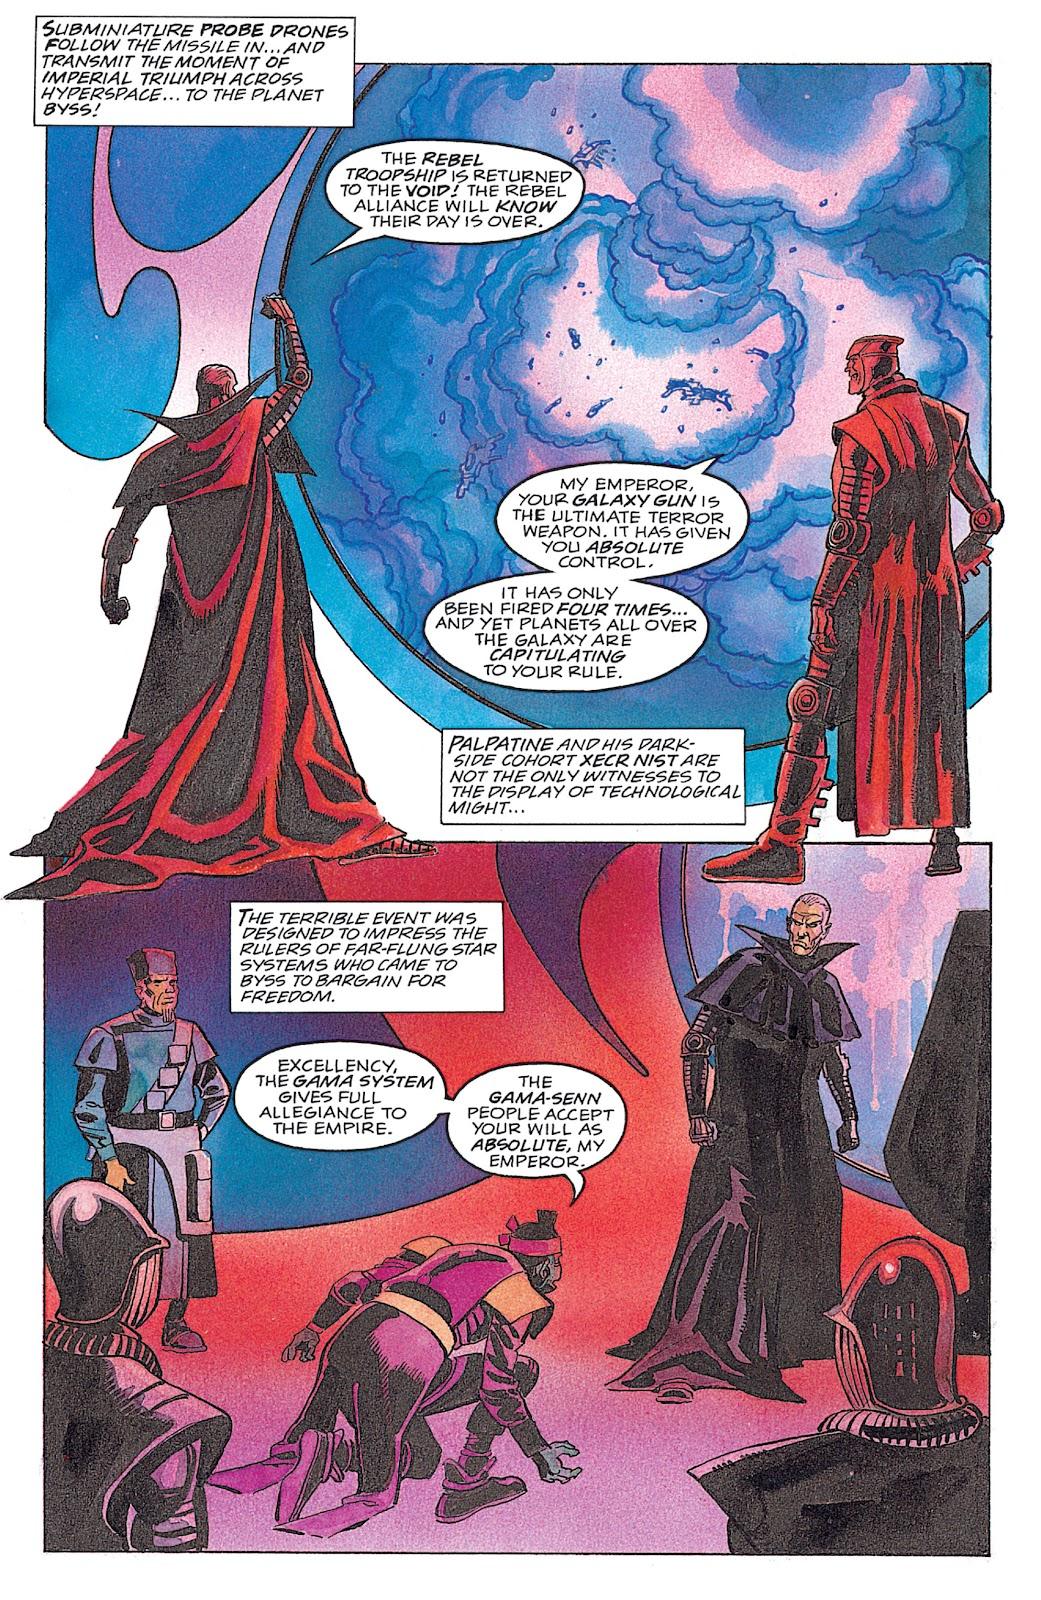 Read online Star Wars: Dark Empire Trilogy comic -  Issue # TPB (Part 4) - 13